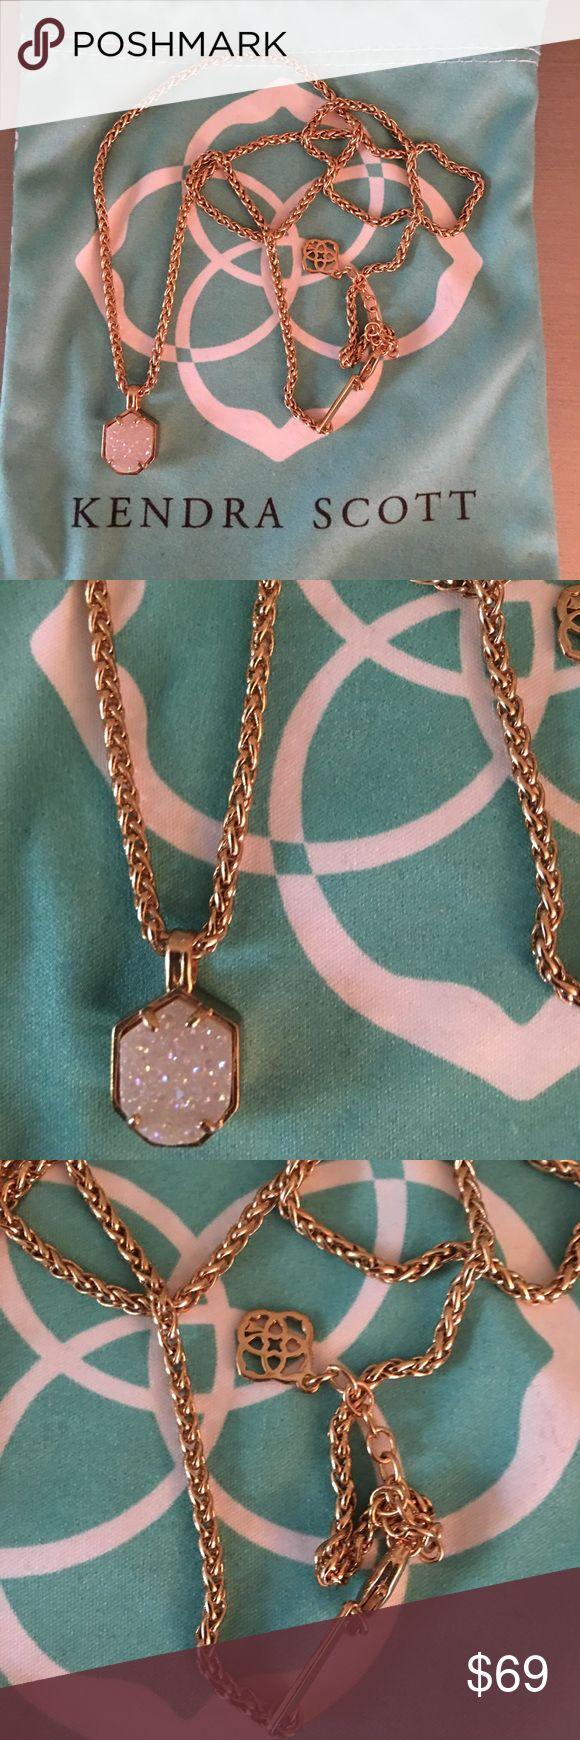 🛍 Kendra Scott Olive Rose Druzy Gold Necklace Gold tone. Kendra Scott Jewelry Necklaces